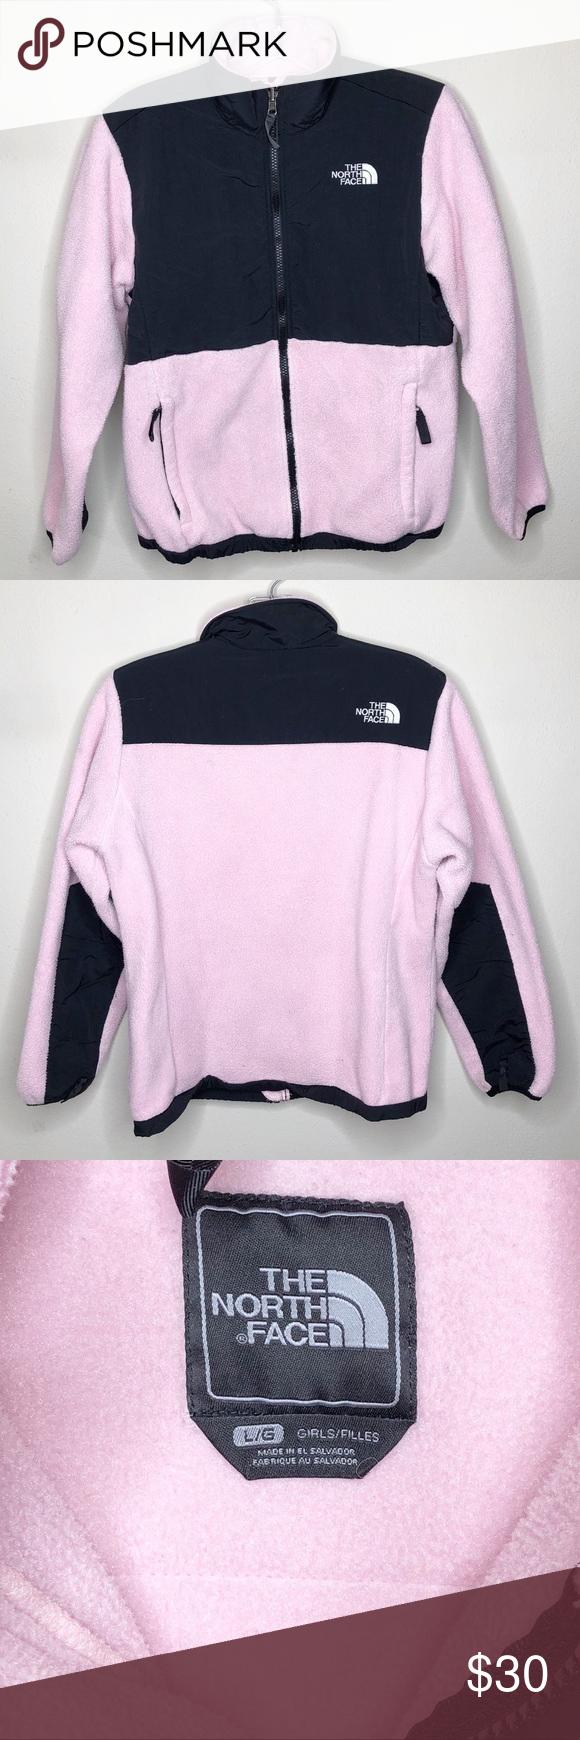 The North Face Denali Jacket Pink Black Girls L The North Face Black Girls Black Pink [ 1740 x 580 Pixel ]